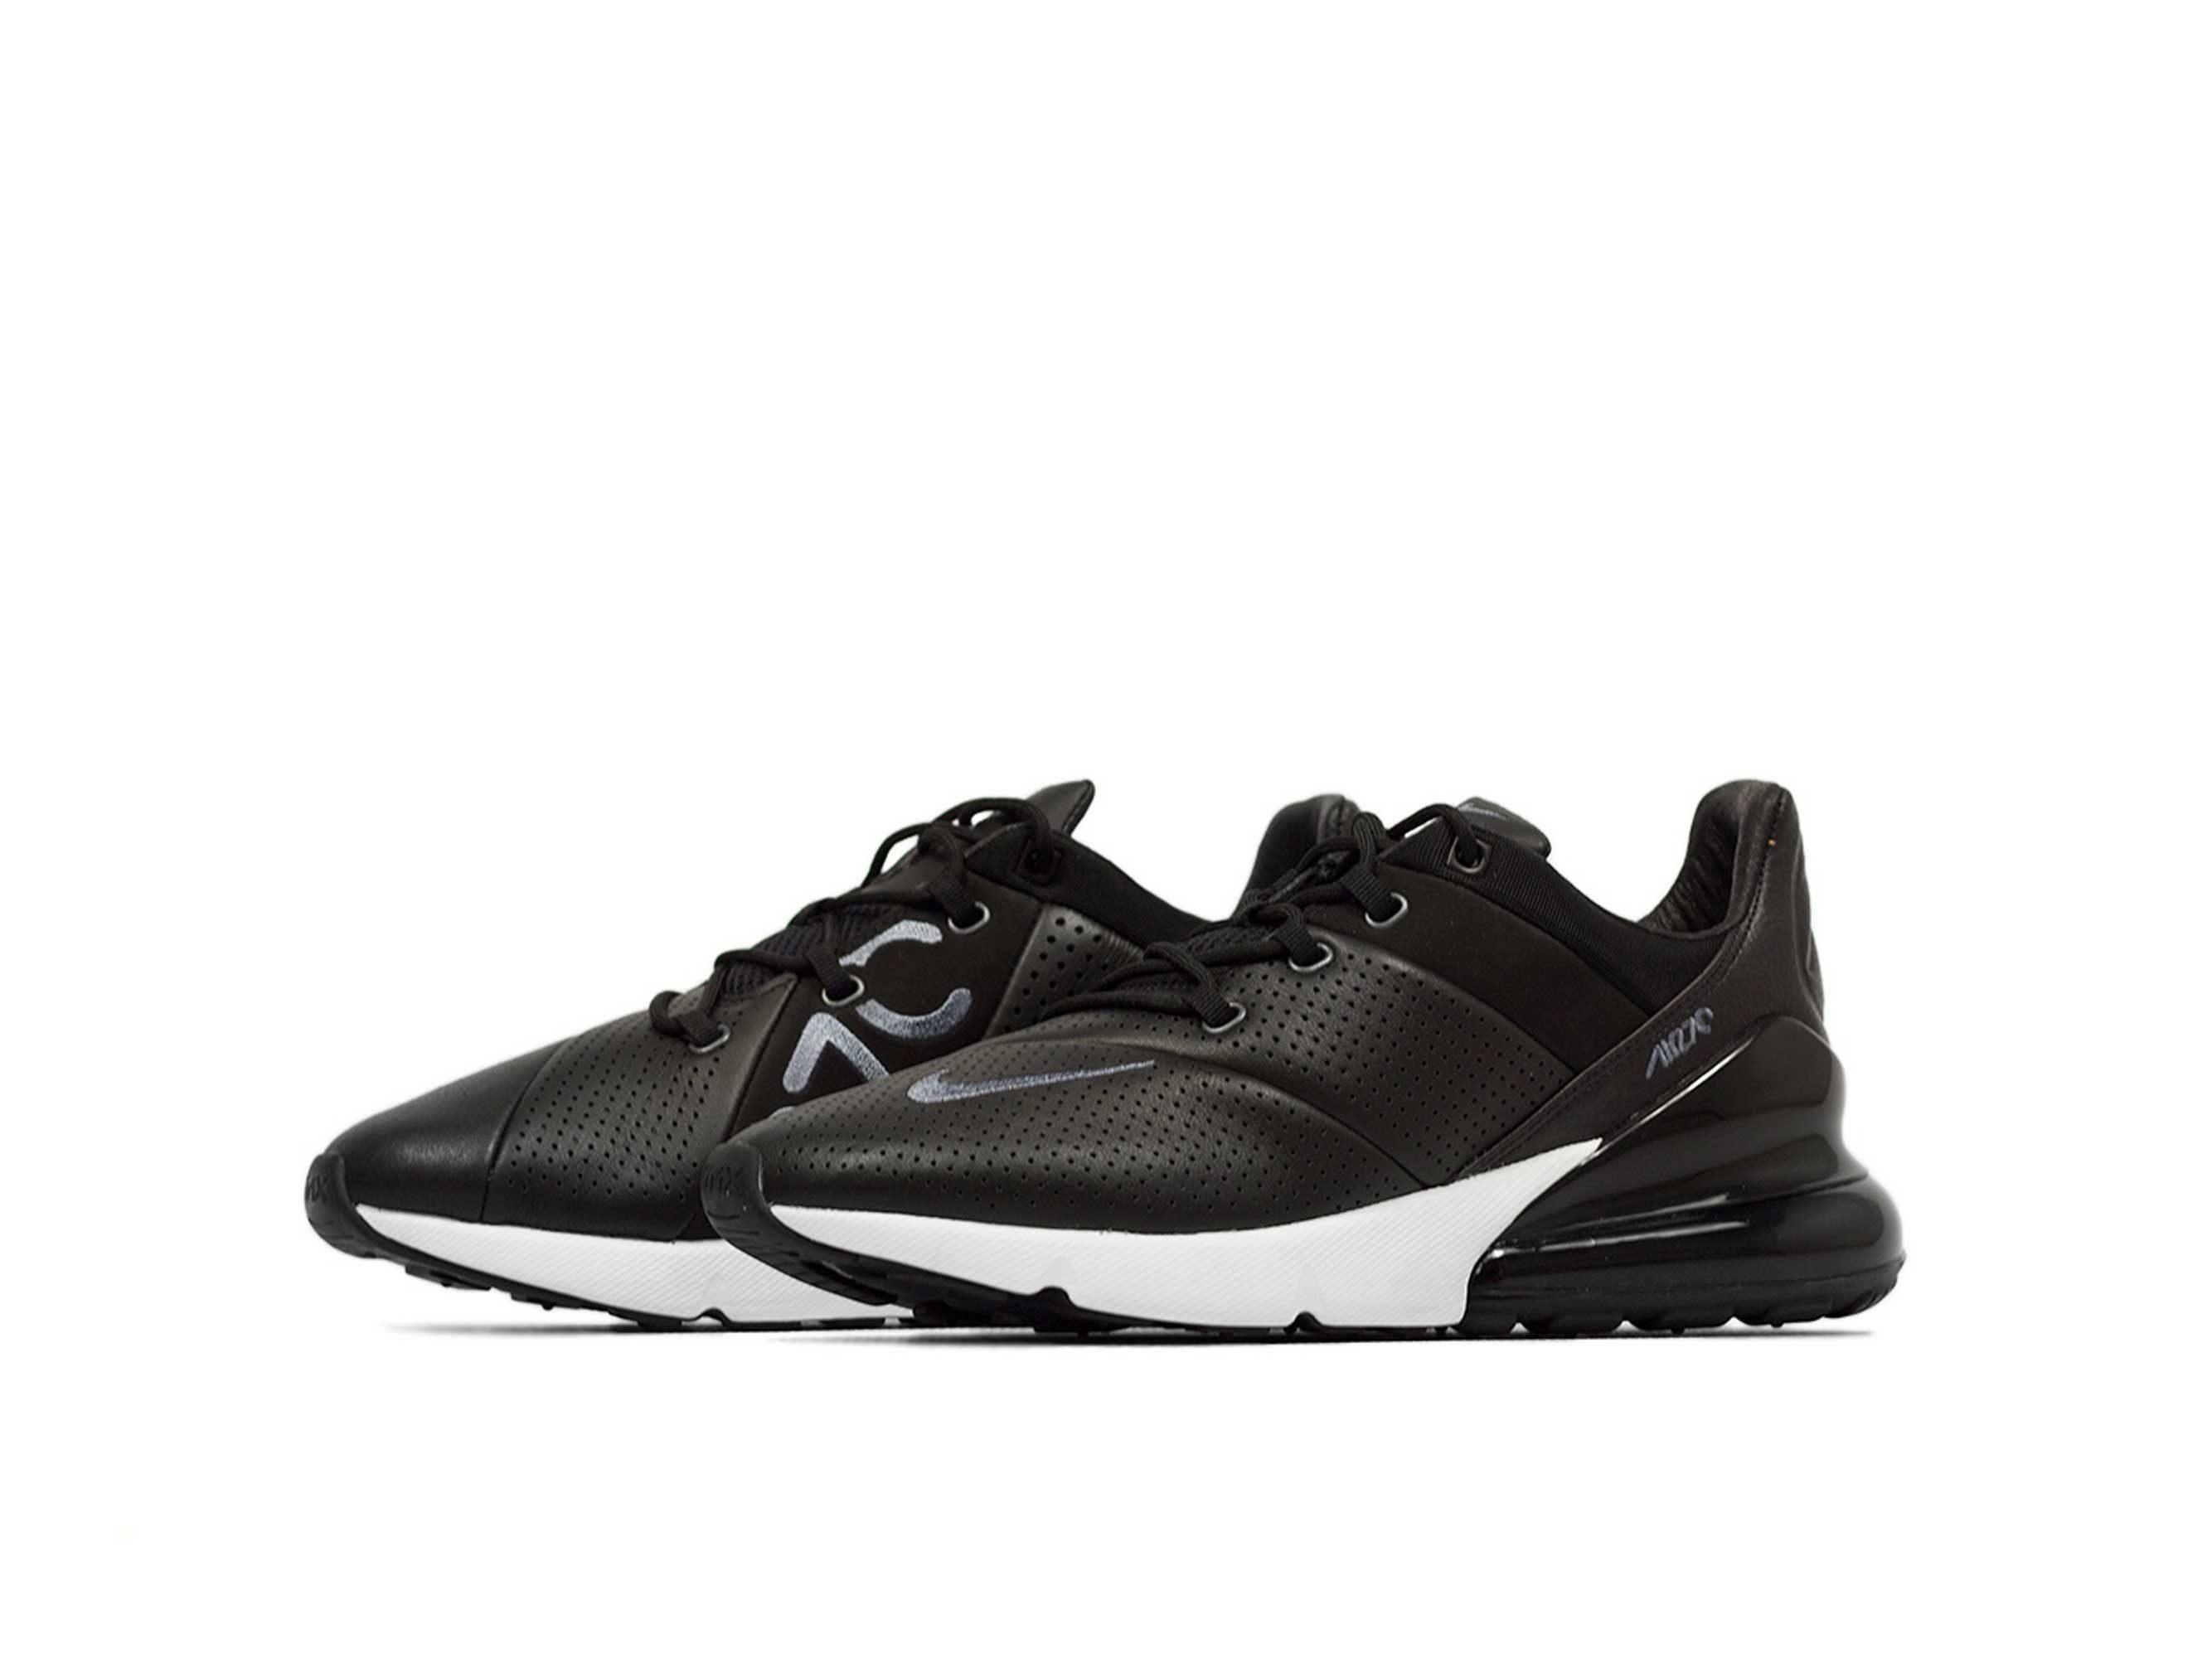 nike air max 270 black white ao8283_001 купить